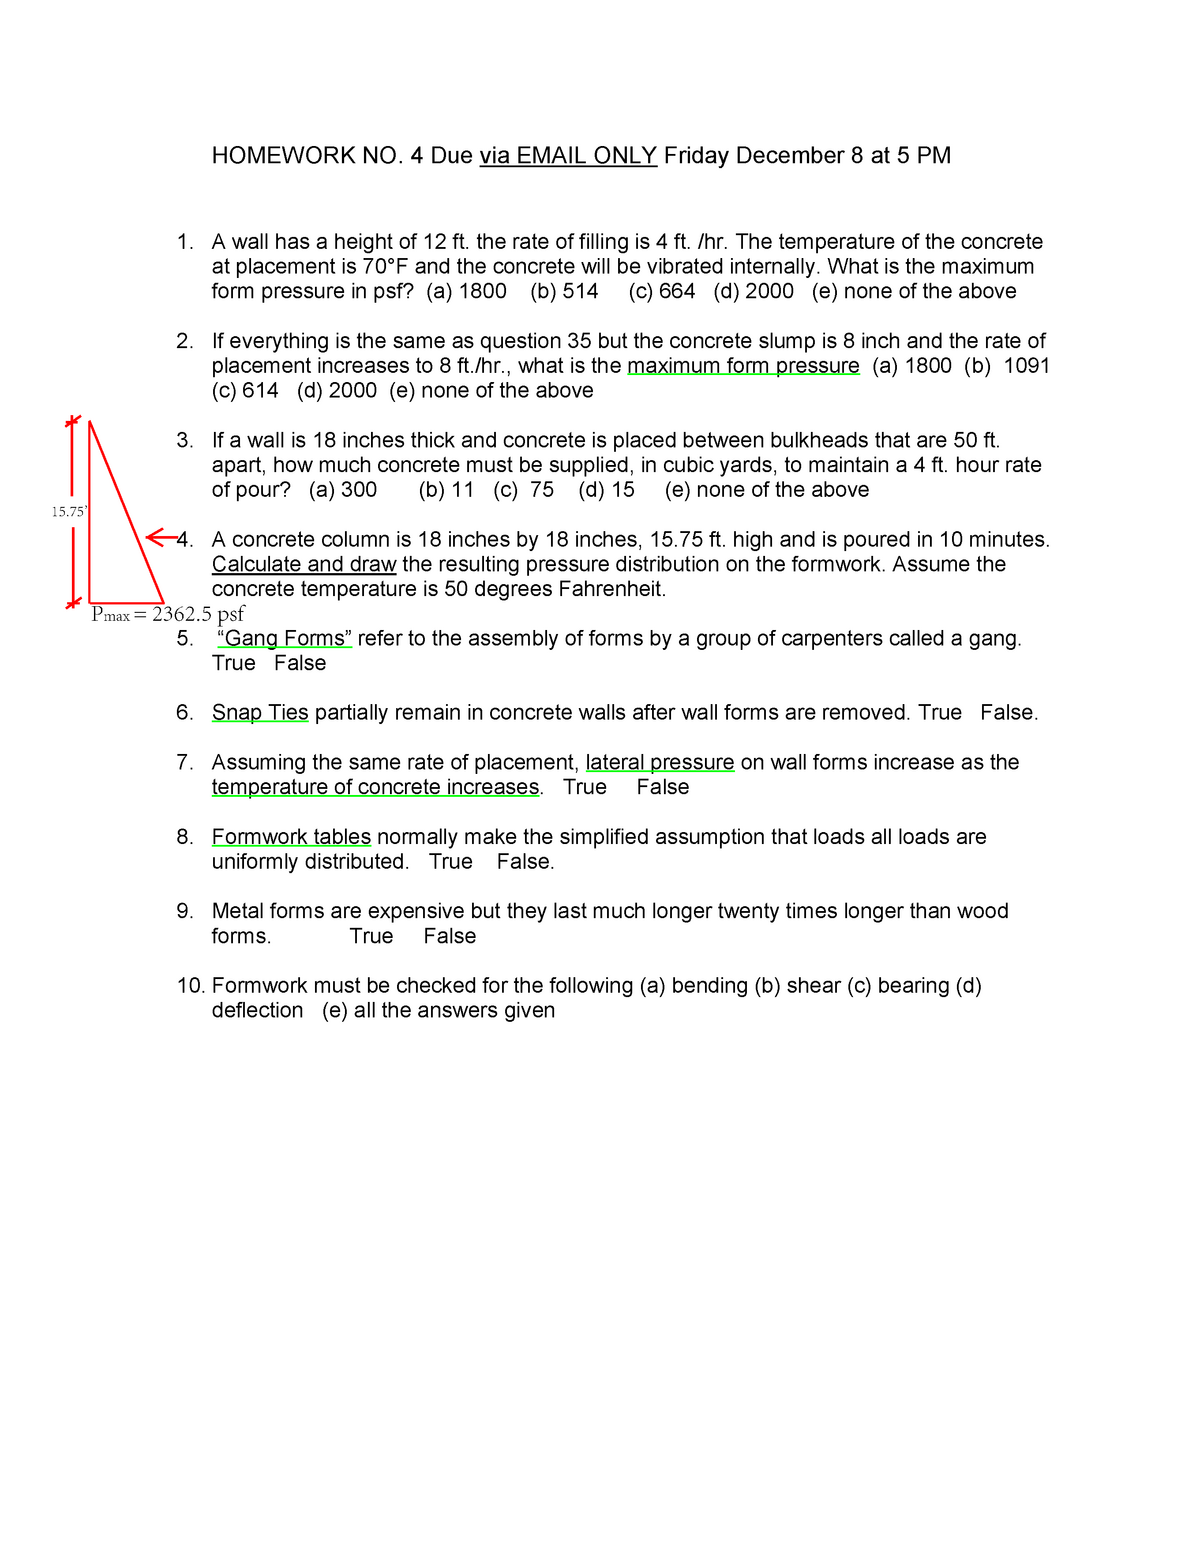 Hw4 solutions - hw4 - E4131: PRIN OF CONSTRUCTN TECHNIQUES